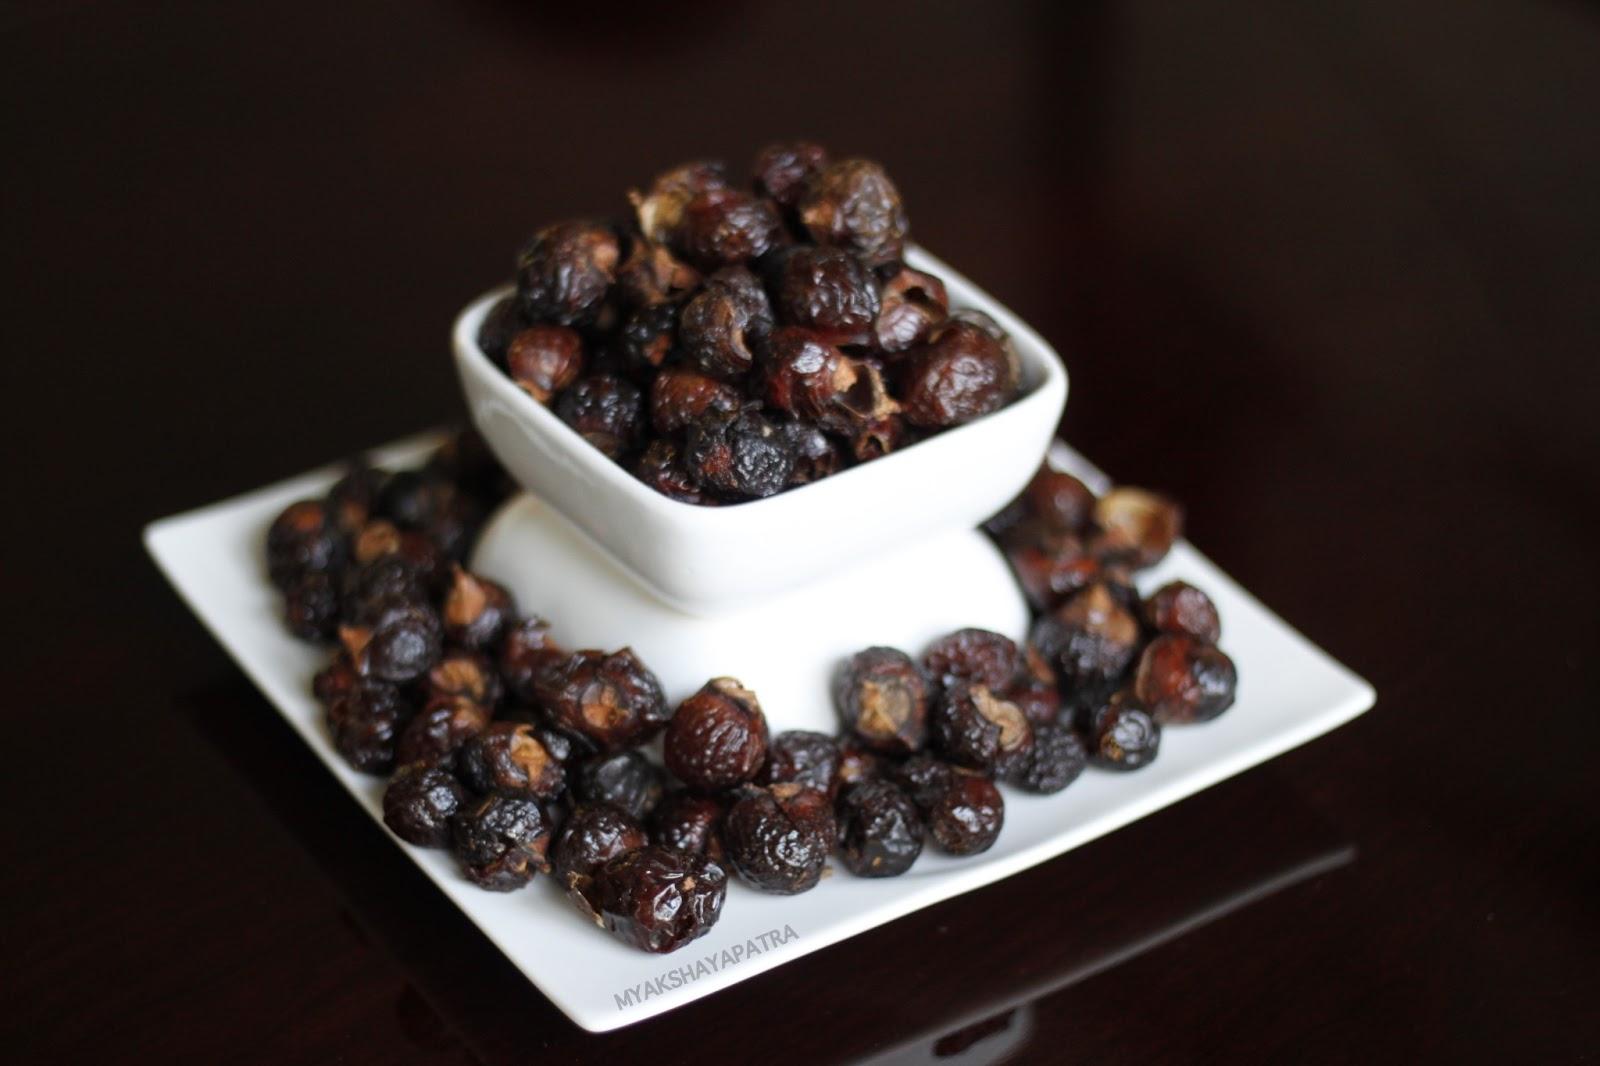 How to use Kunkudukai Kunkudkaya Soap nuts for hair care